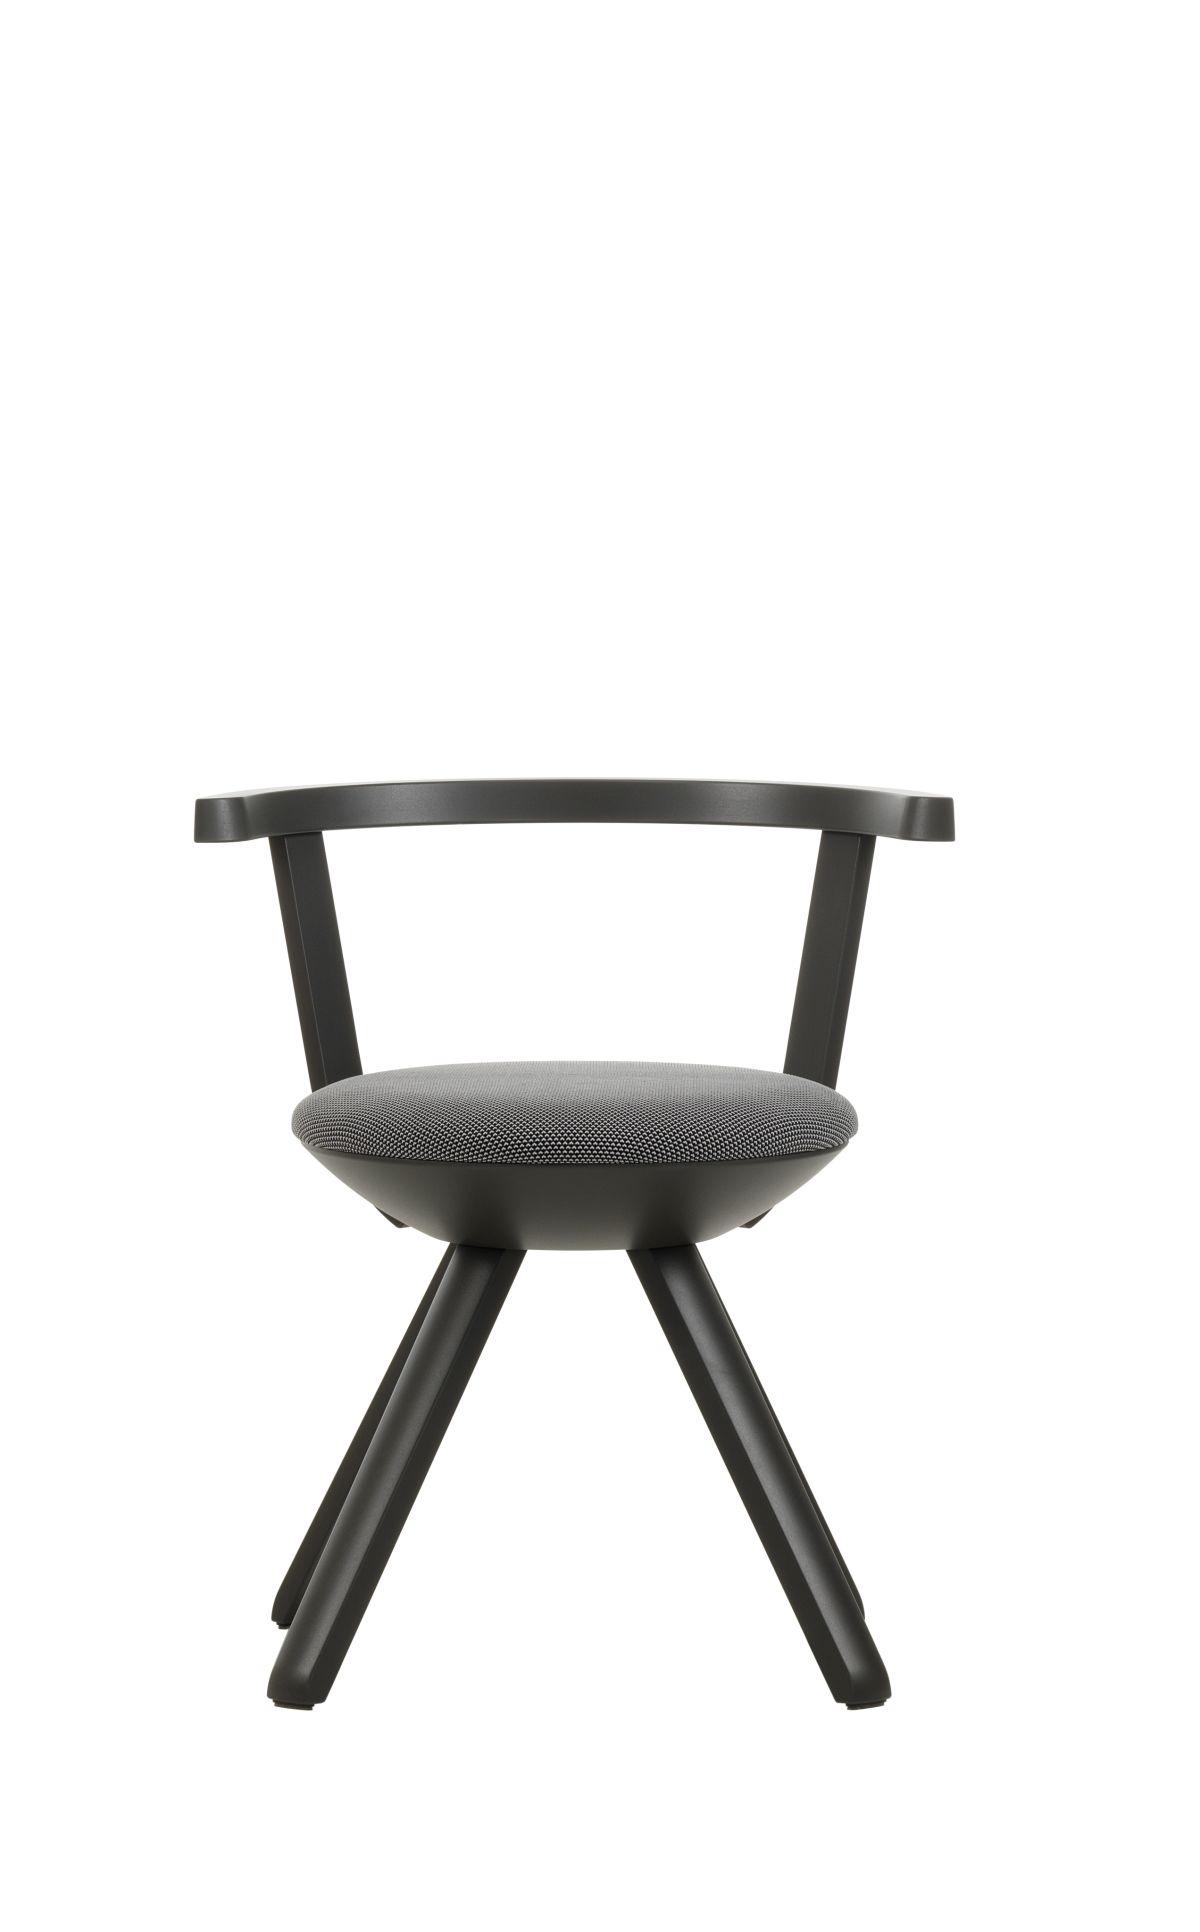 Rival-Chair-Kg001-Asphalt-Lacquer-Black-White-3D-Knit-Upholstery